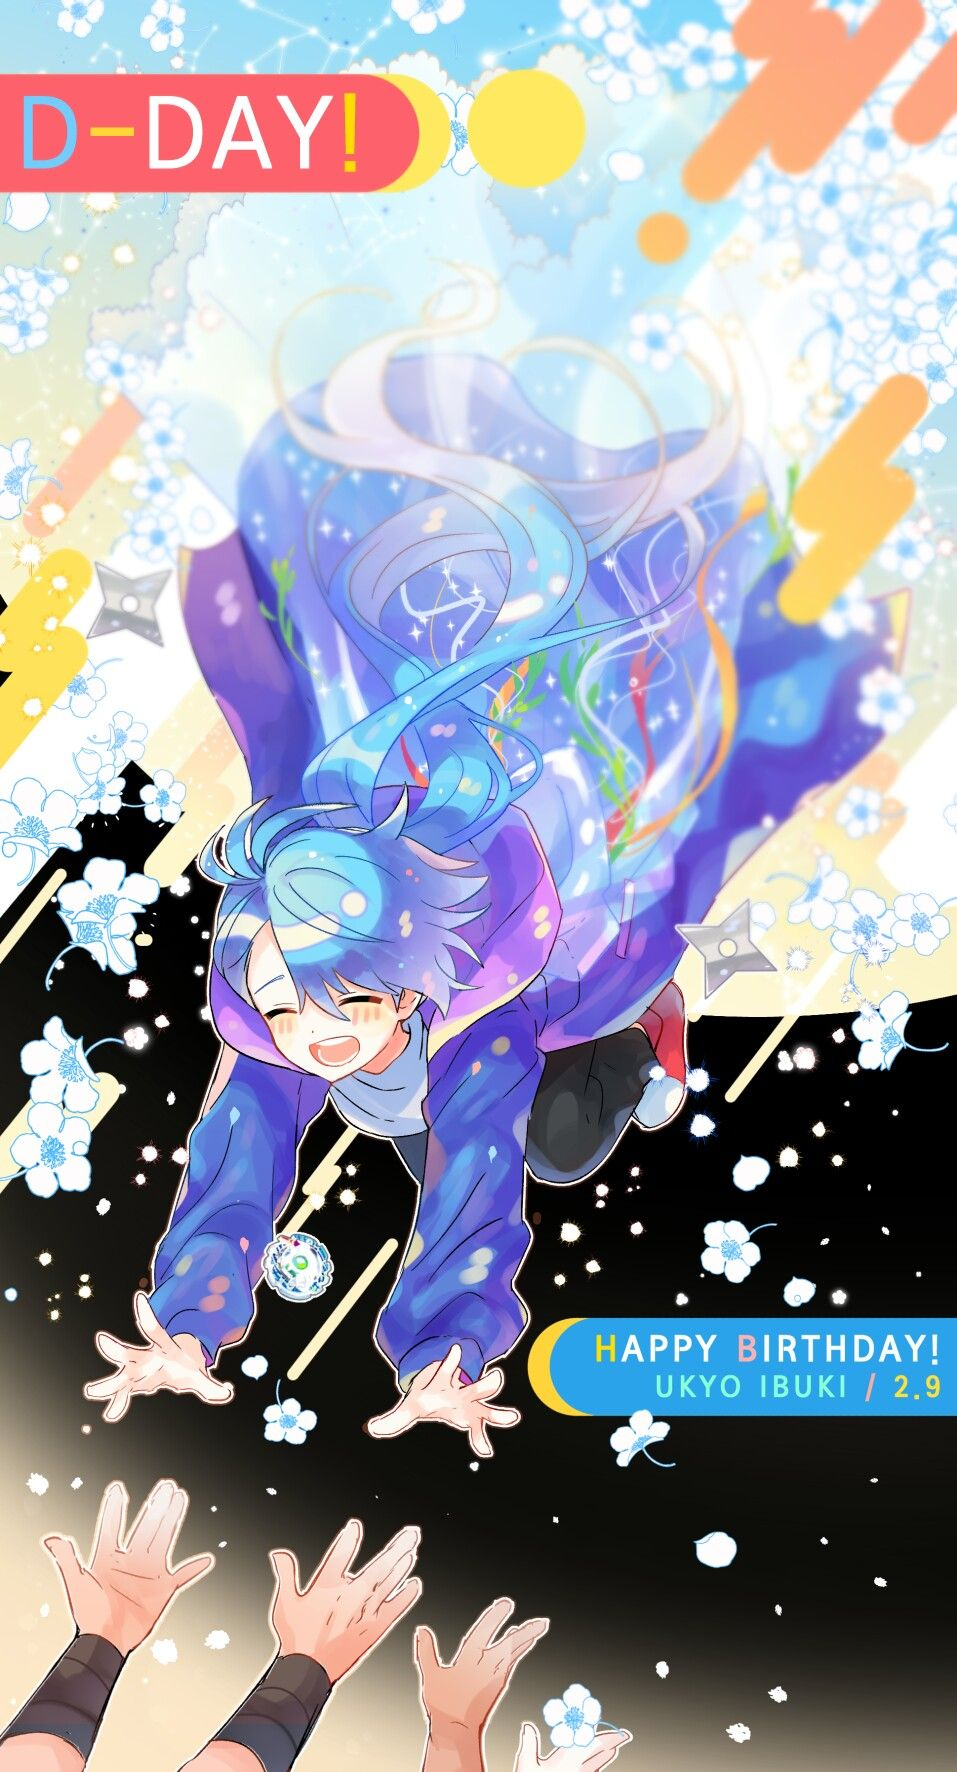 Happy birthday ukyo ibuki carta